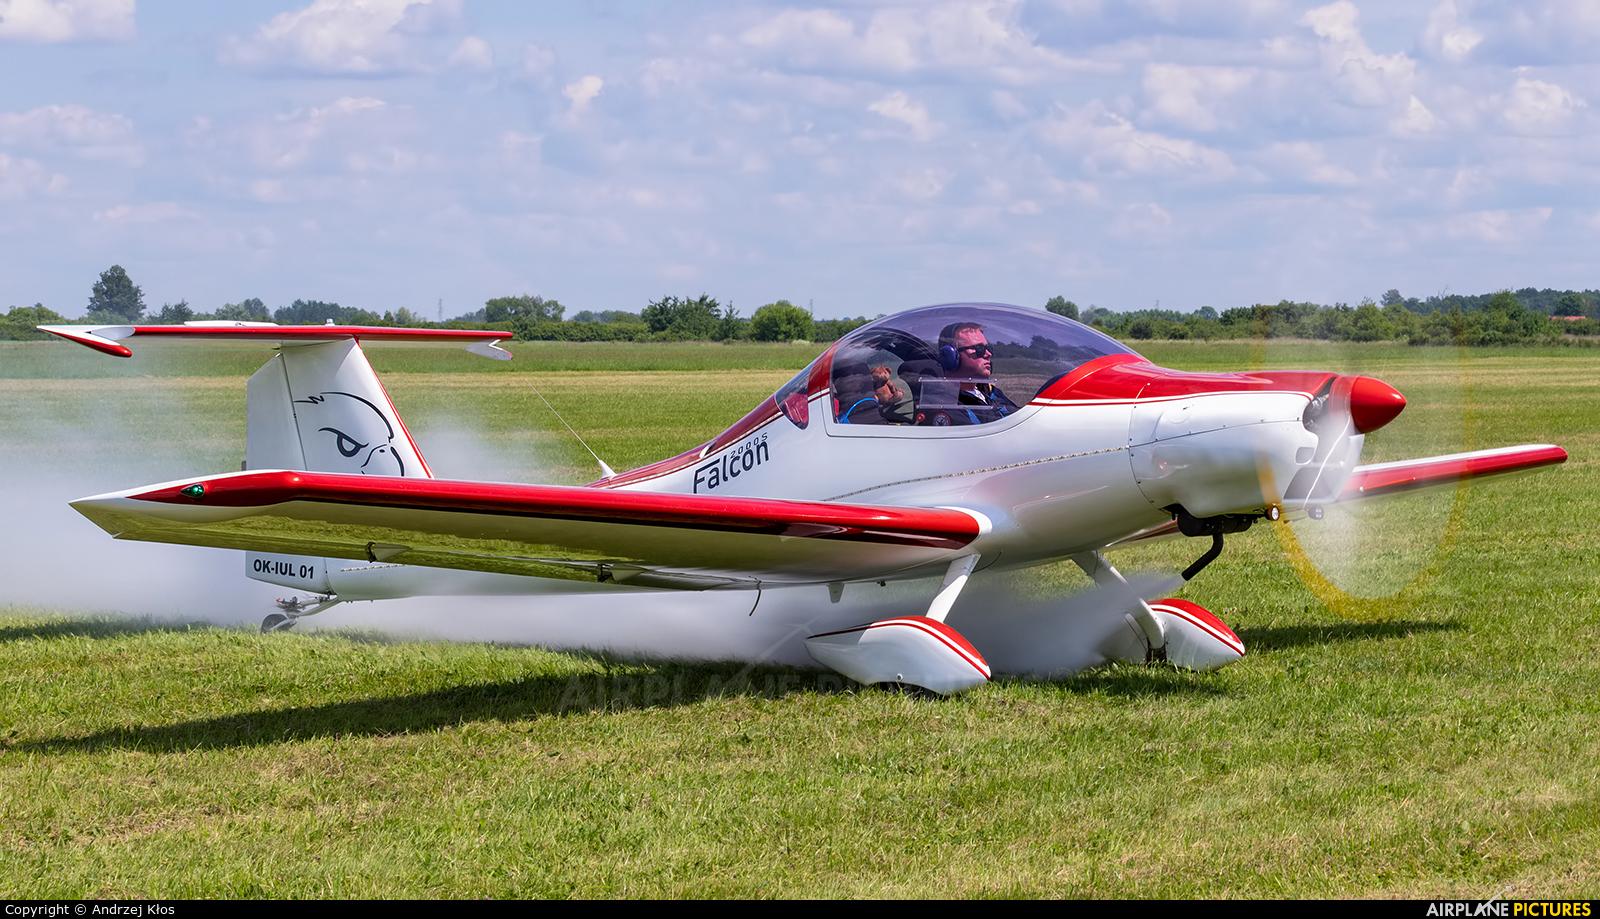 Private OK-IUL01 aircraft at Stalowa Wola-Turbia